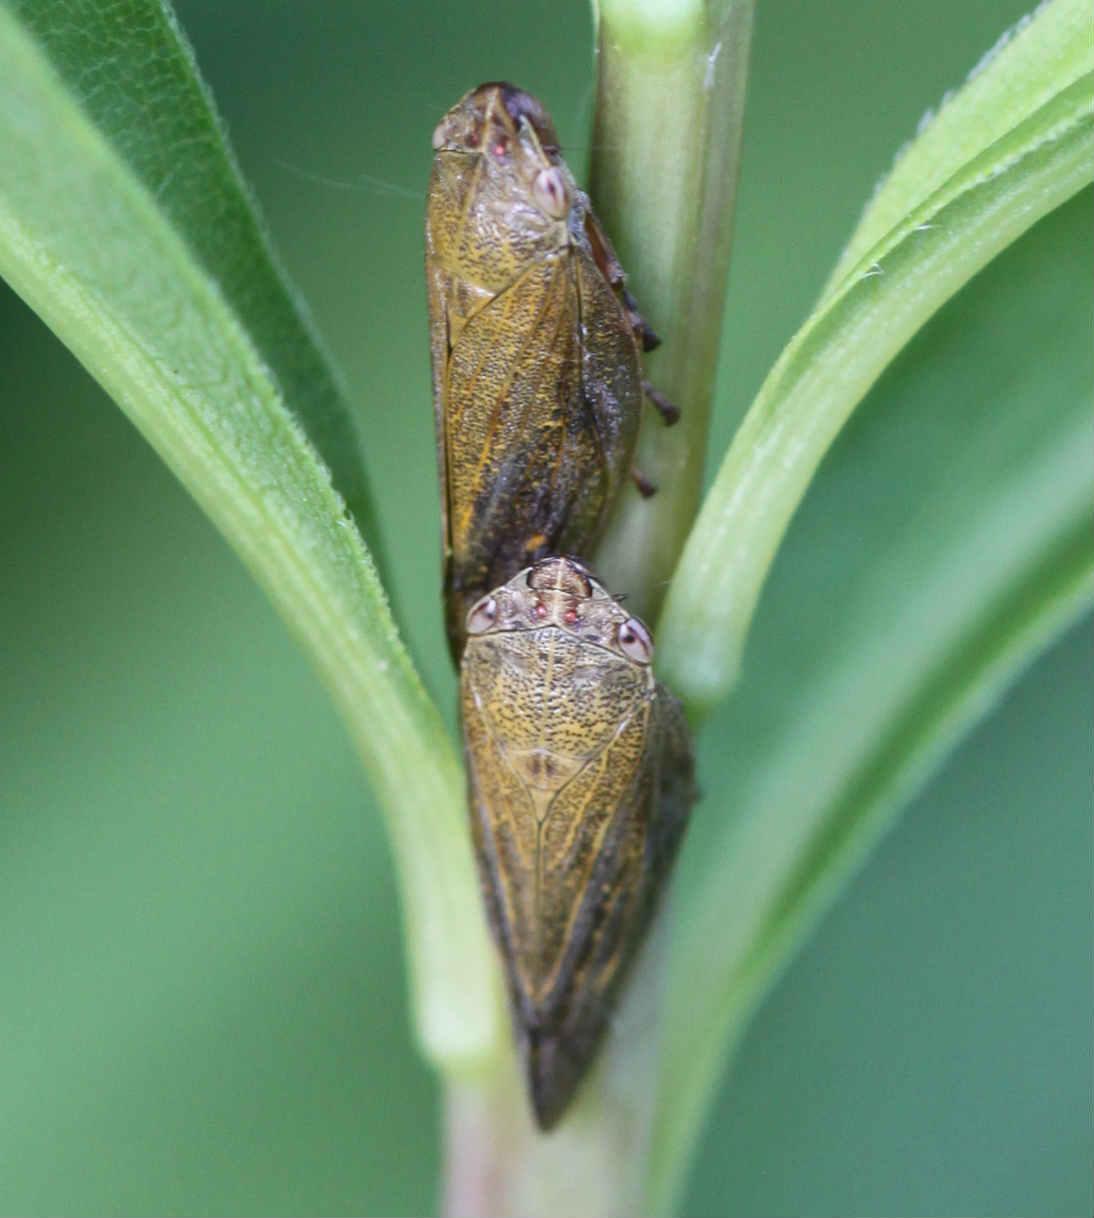 Image of spittle bug